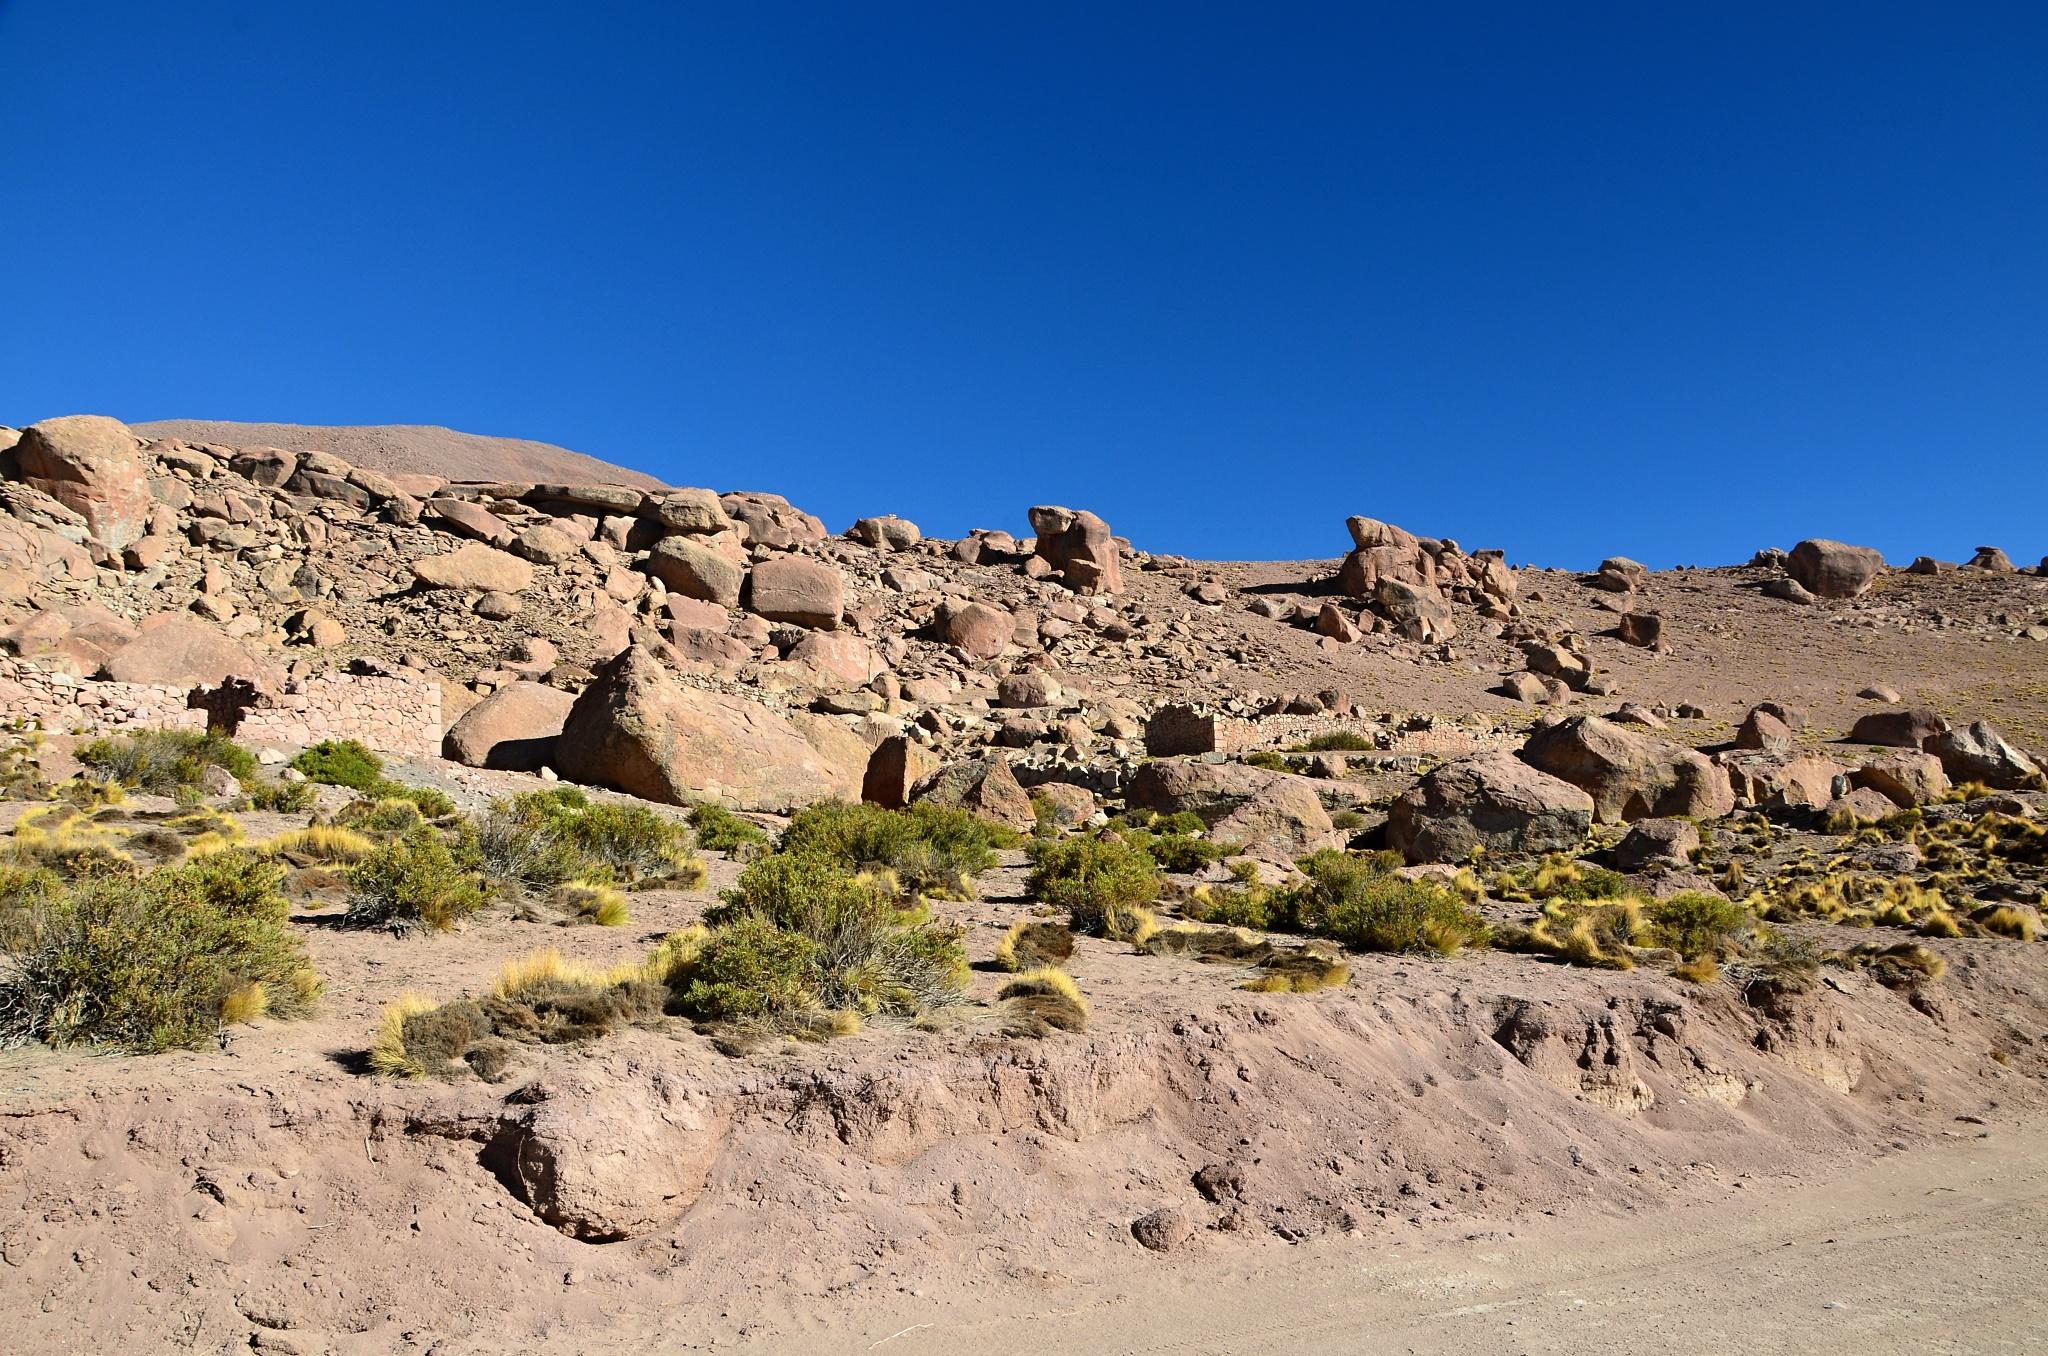 Kamenitý svah u gejzírů, kde žijí jihoamerické Viskače